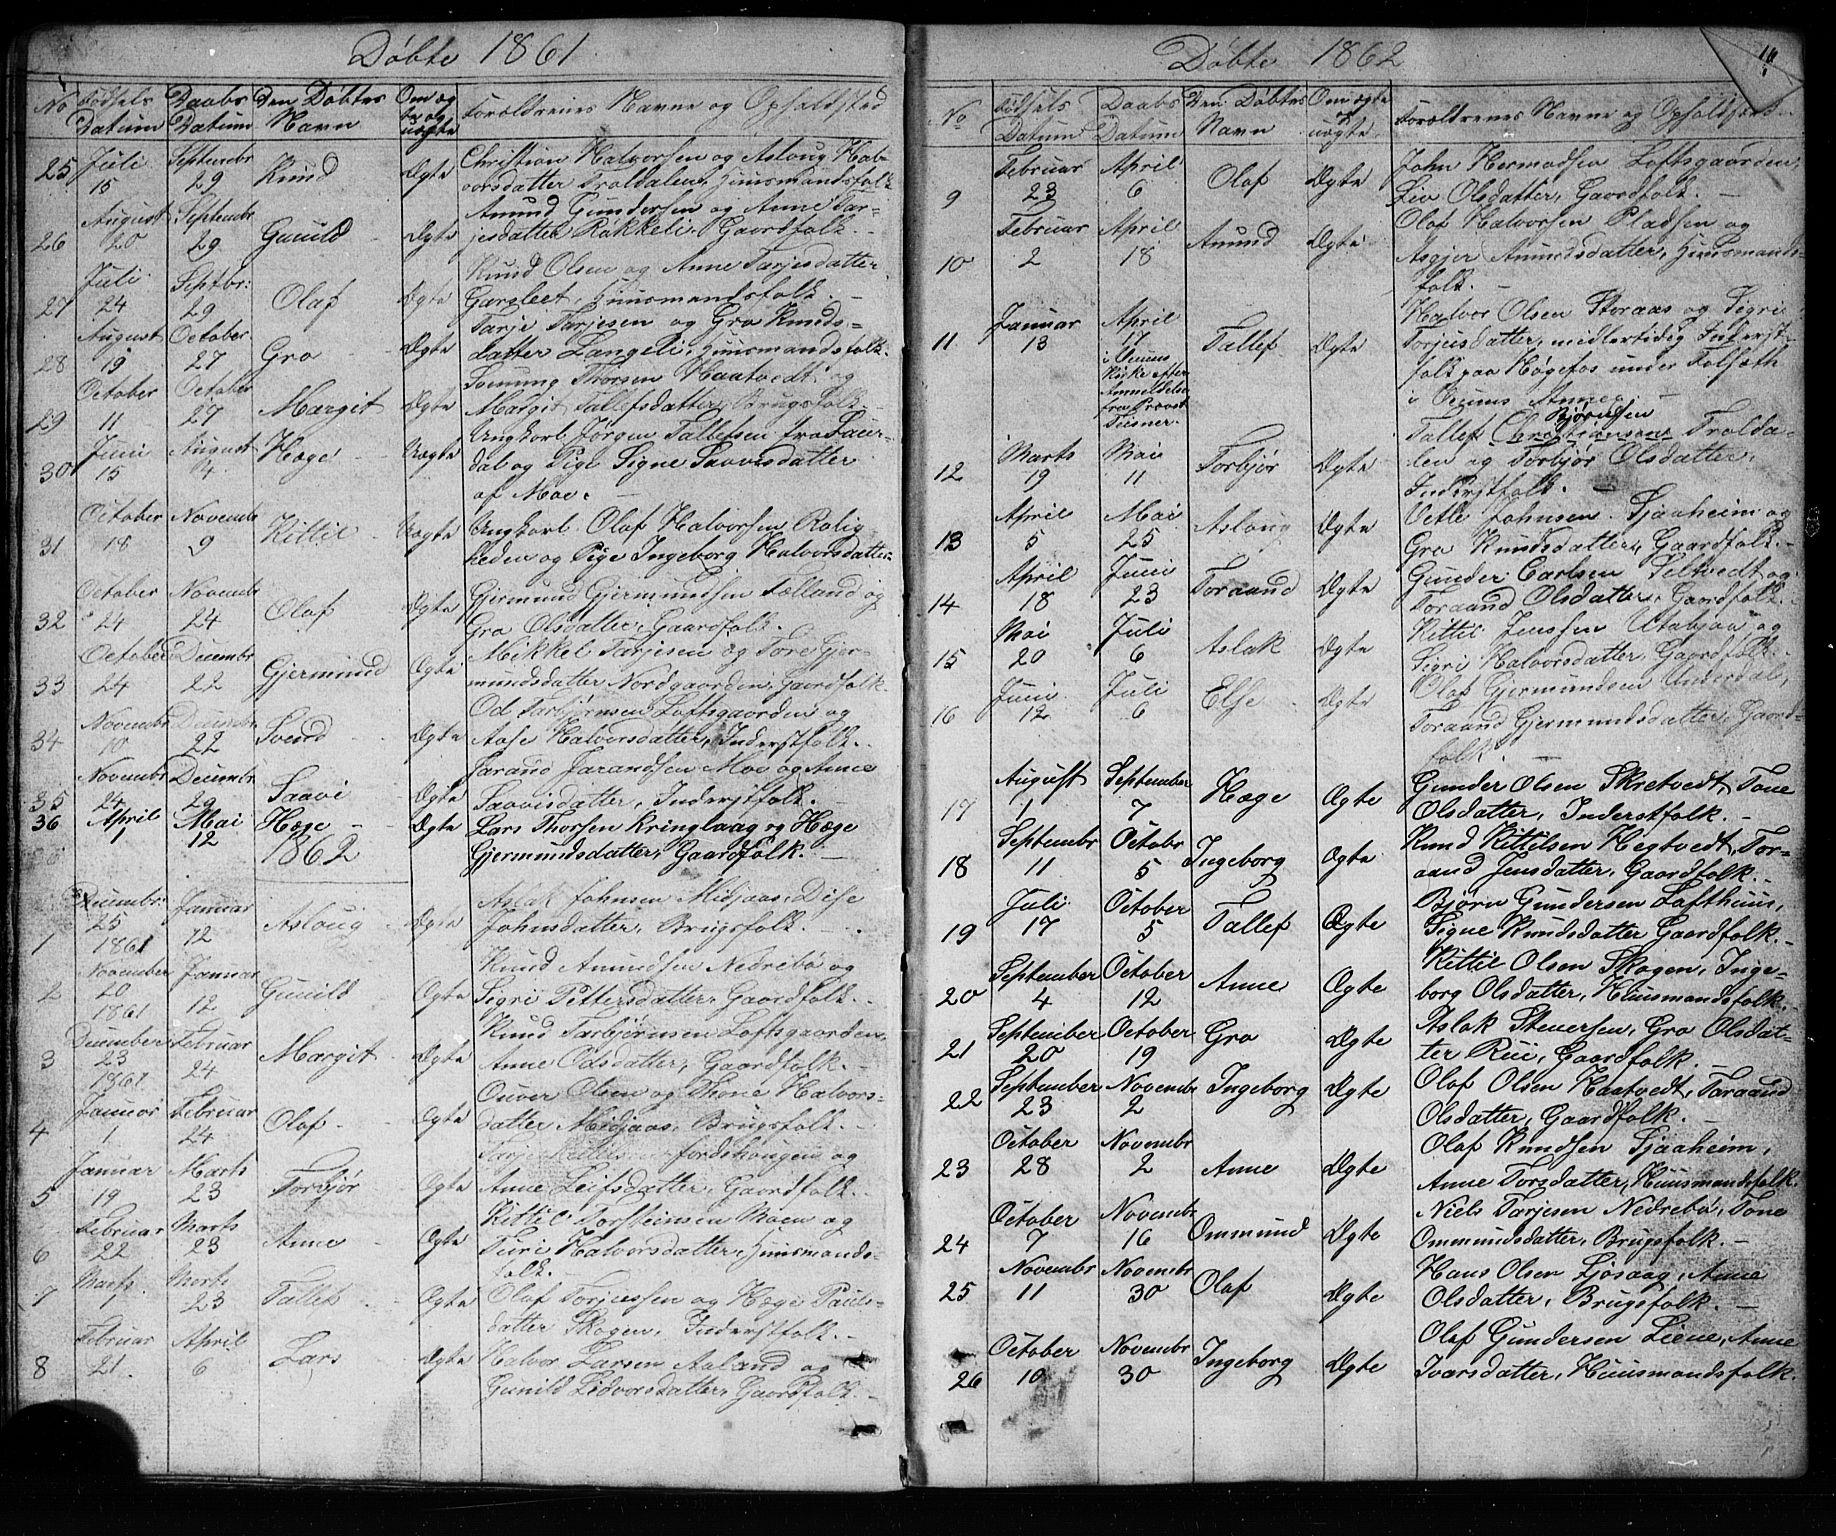 SAKO, Mo kirkebøker, G/Ga/L0001: Klokkerbok nr. I 1, 1851-1891, s. 15